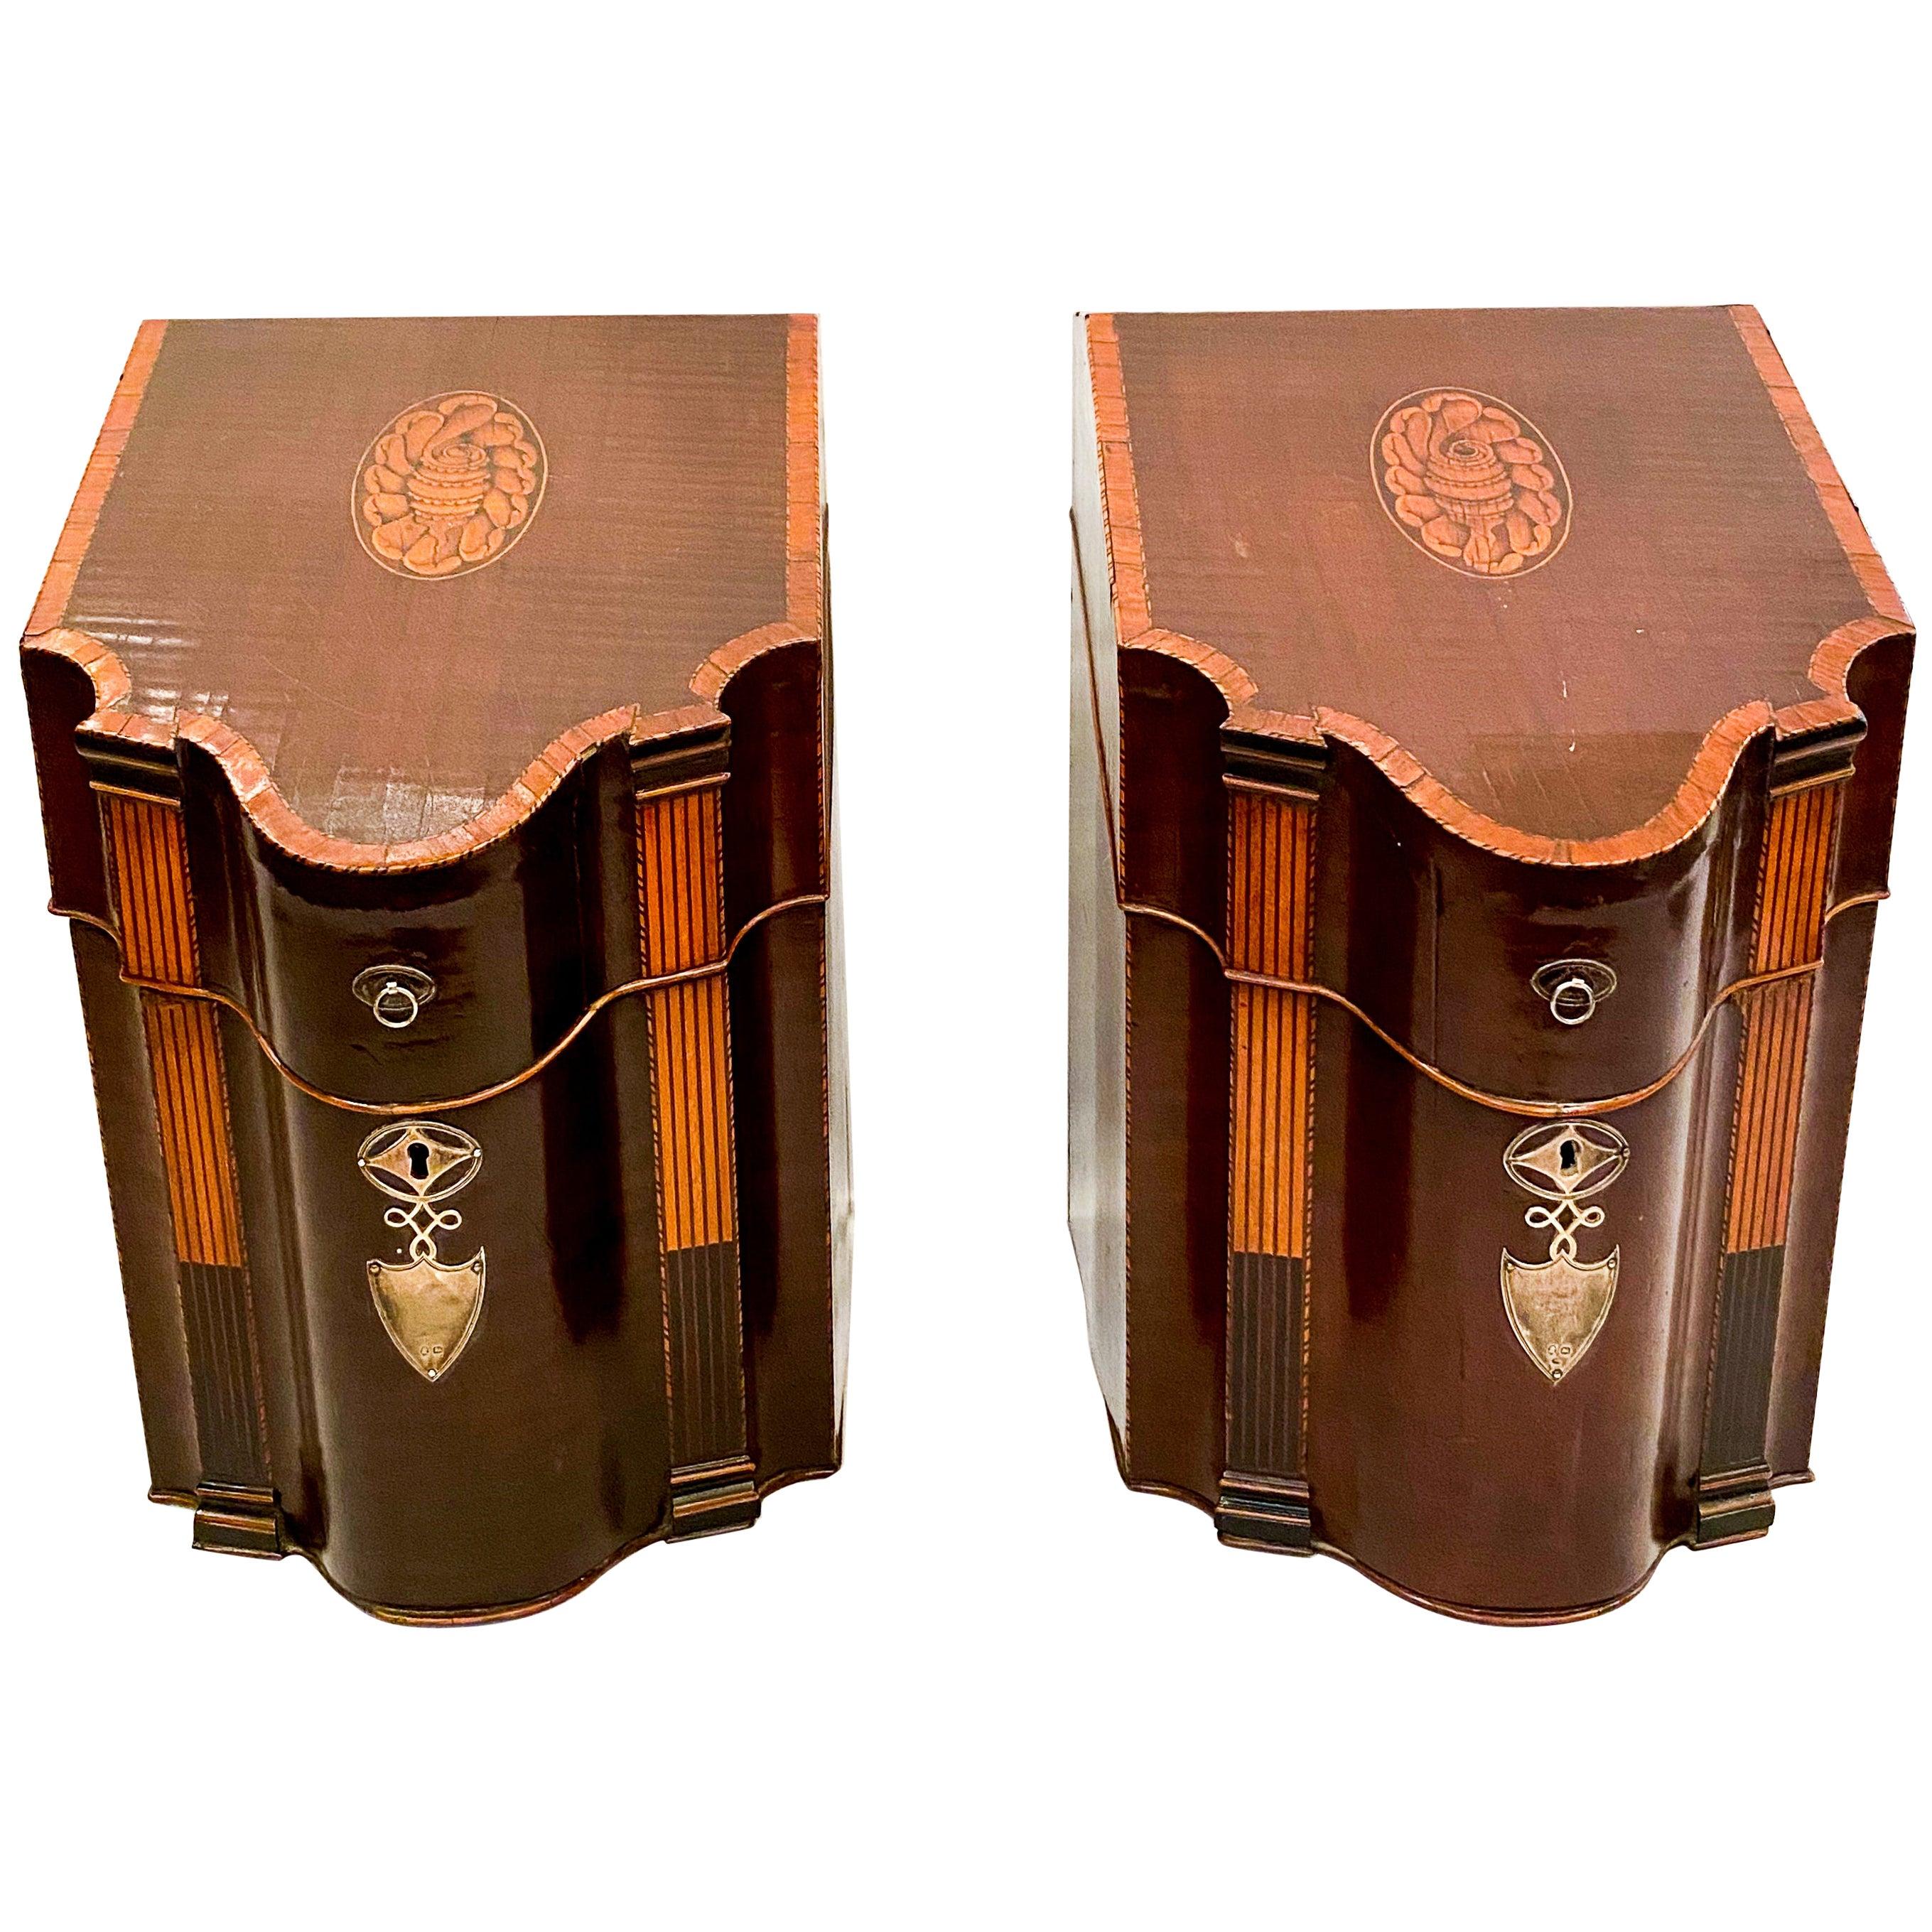 Pair of Antique English Mahogany Sheraton Knife Boxes with Satinwood, circa 1860